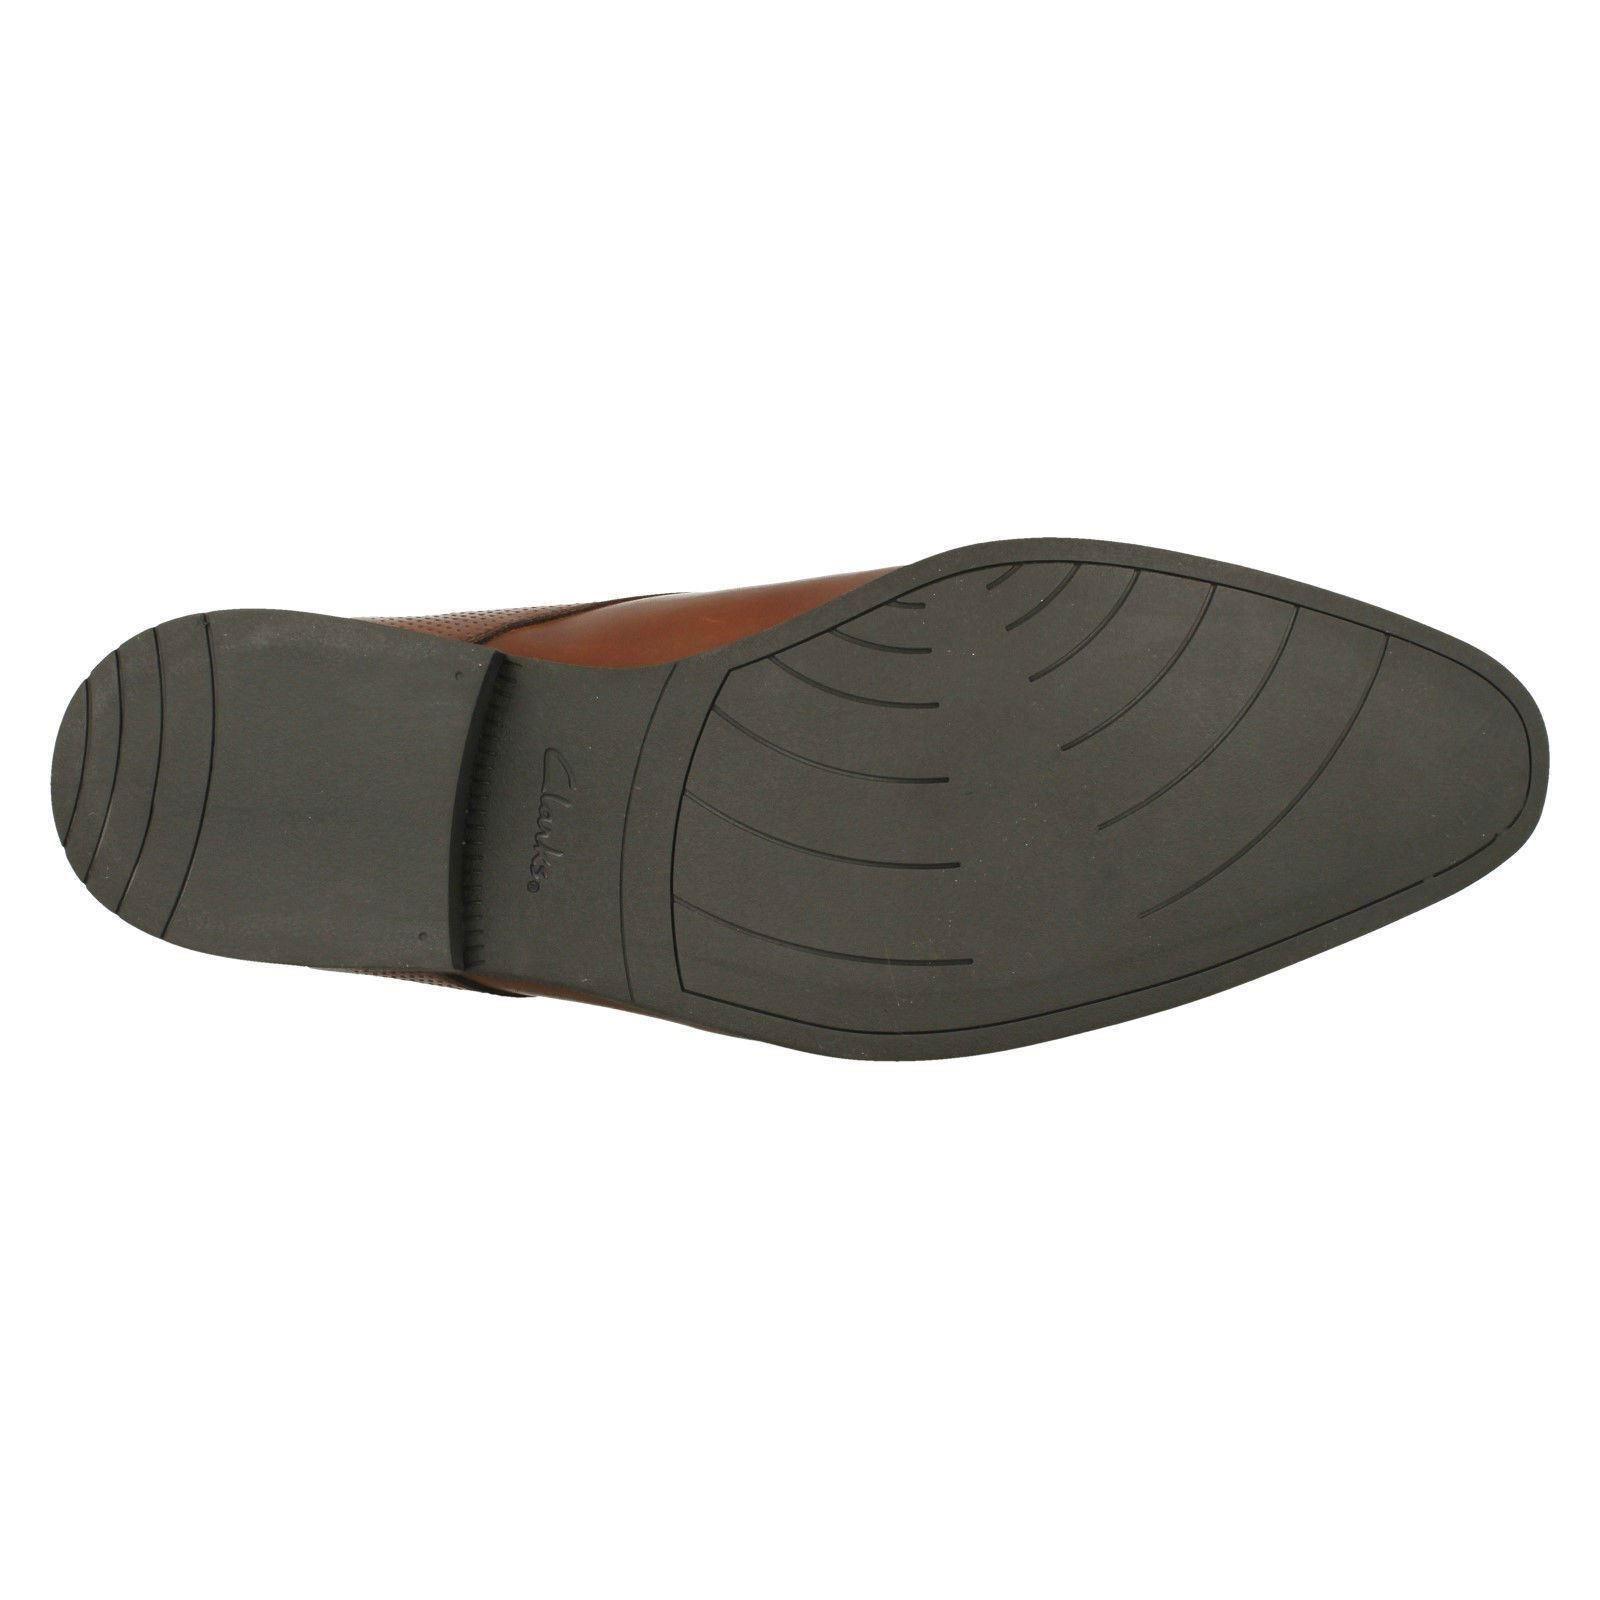 Herren Leder Clarks Leder Herren Lace Up Formal Smart Schuhes Style - Bampton Walk d13a9f